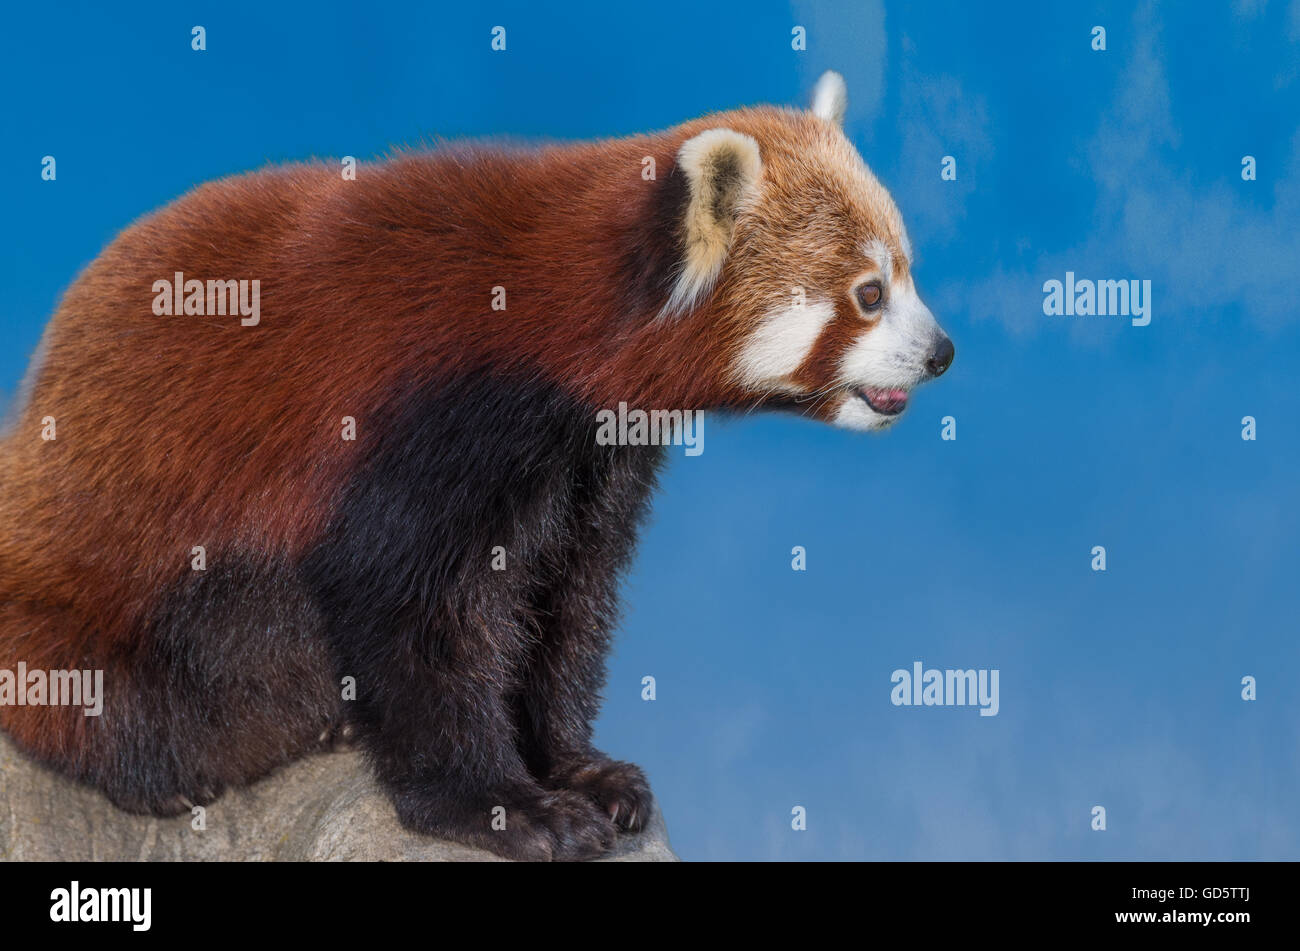 Rd panda. Closeup series - Stock Image